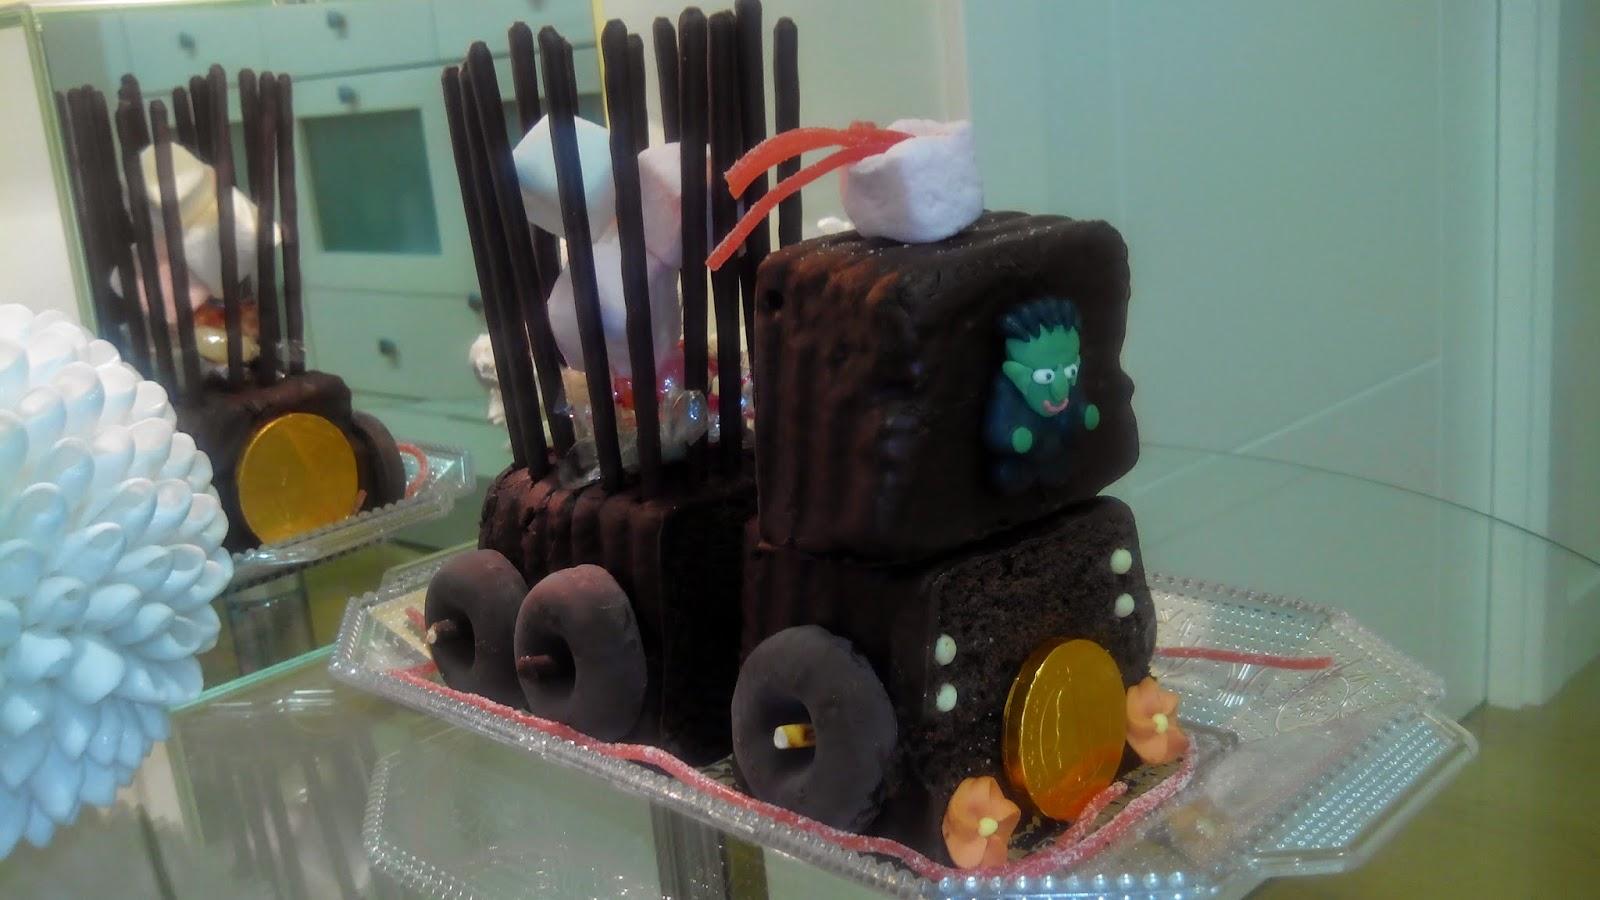 Tarta tren de chocolate, tarta tren, tarta de chocolate, tarta, tarta halloween, halloween, tarta divertida, tarta niños, tarta cumpleaños